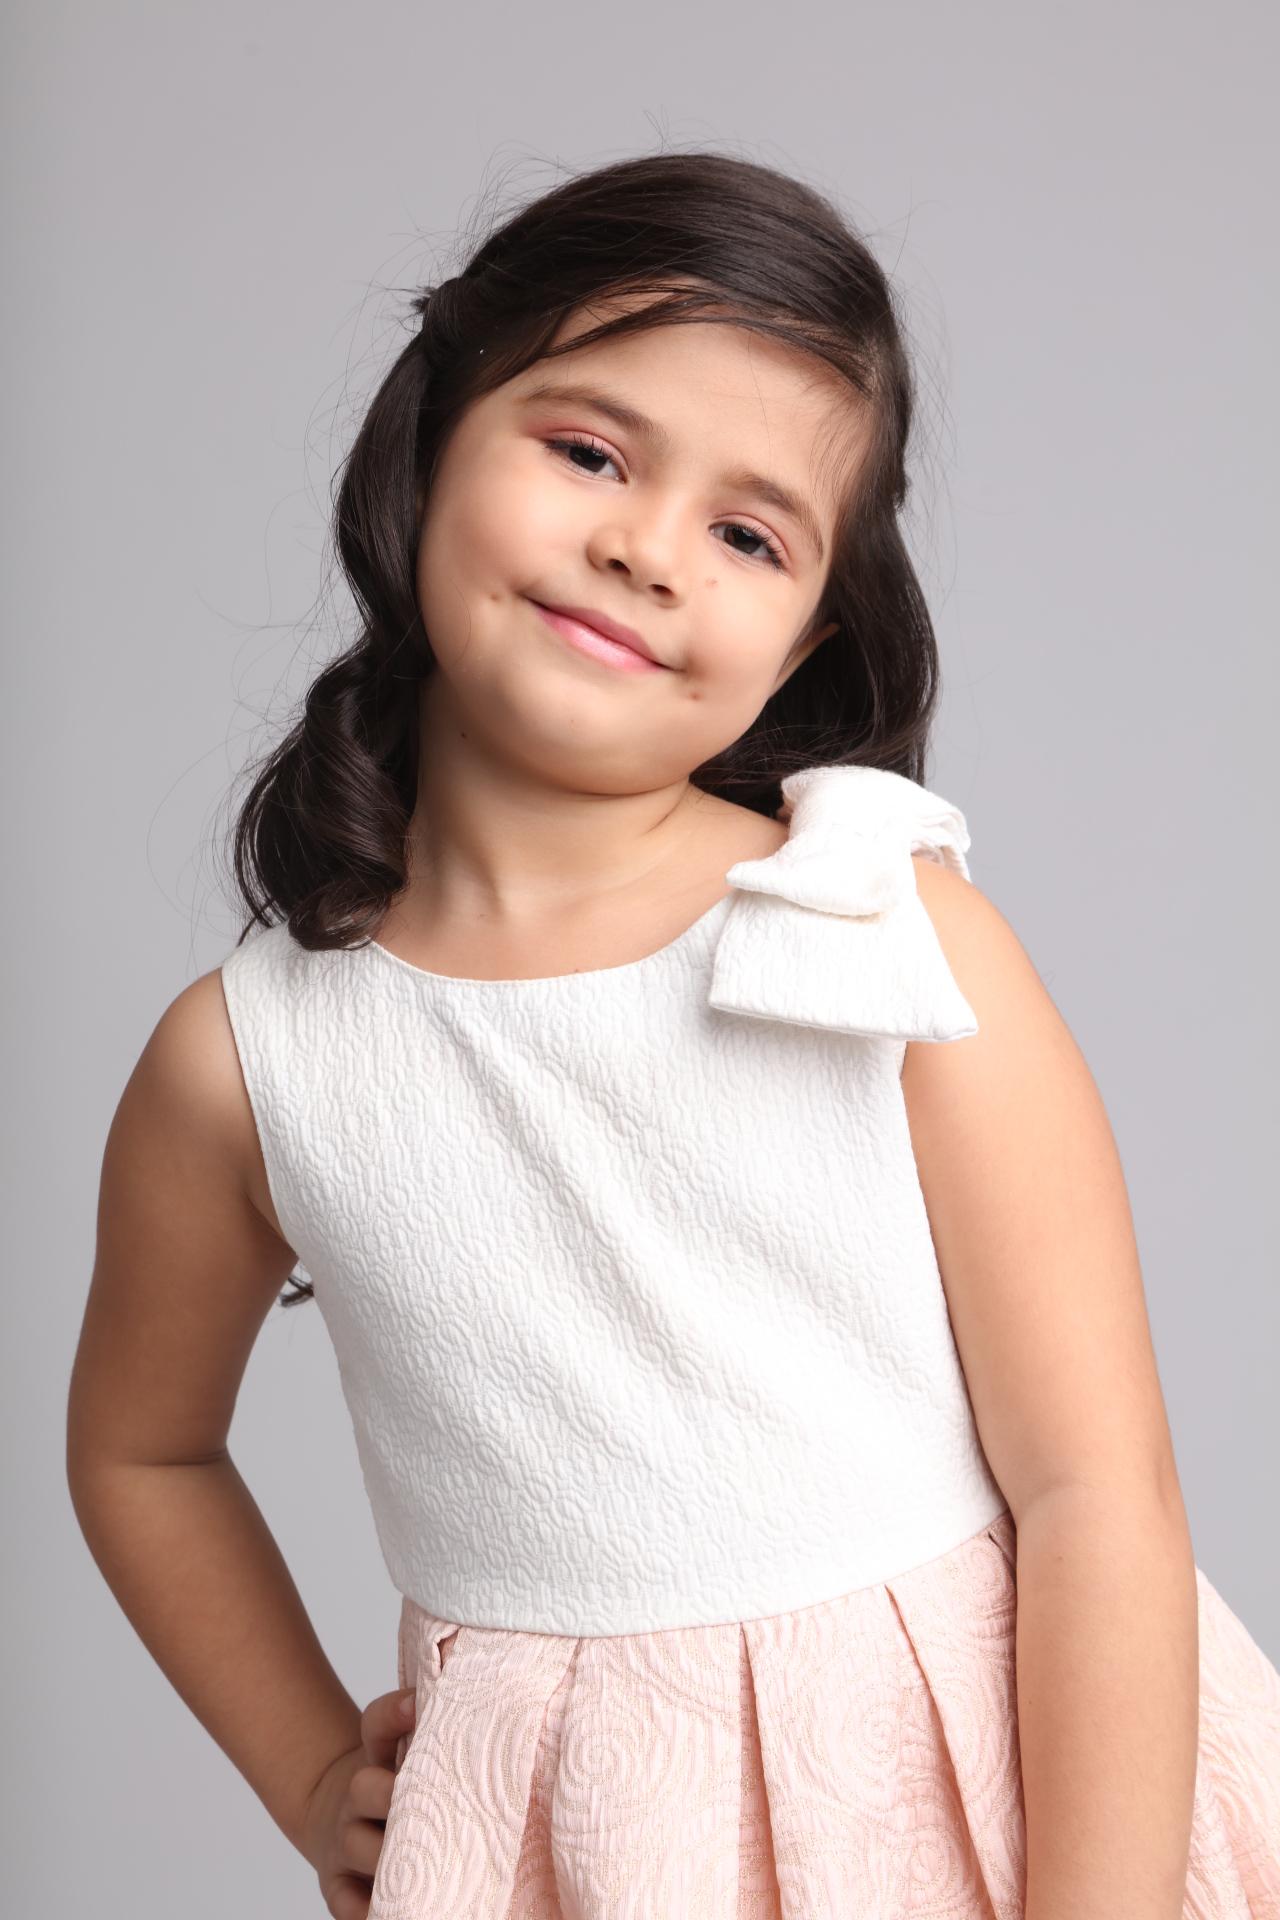 : ABS-CBN TV child star Xia joins 'A Goosebumps Halloween' at the Araneta Center